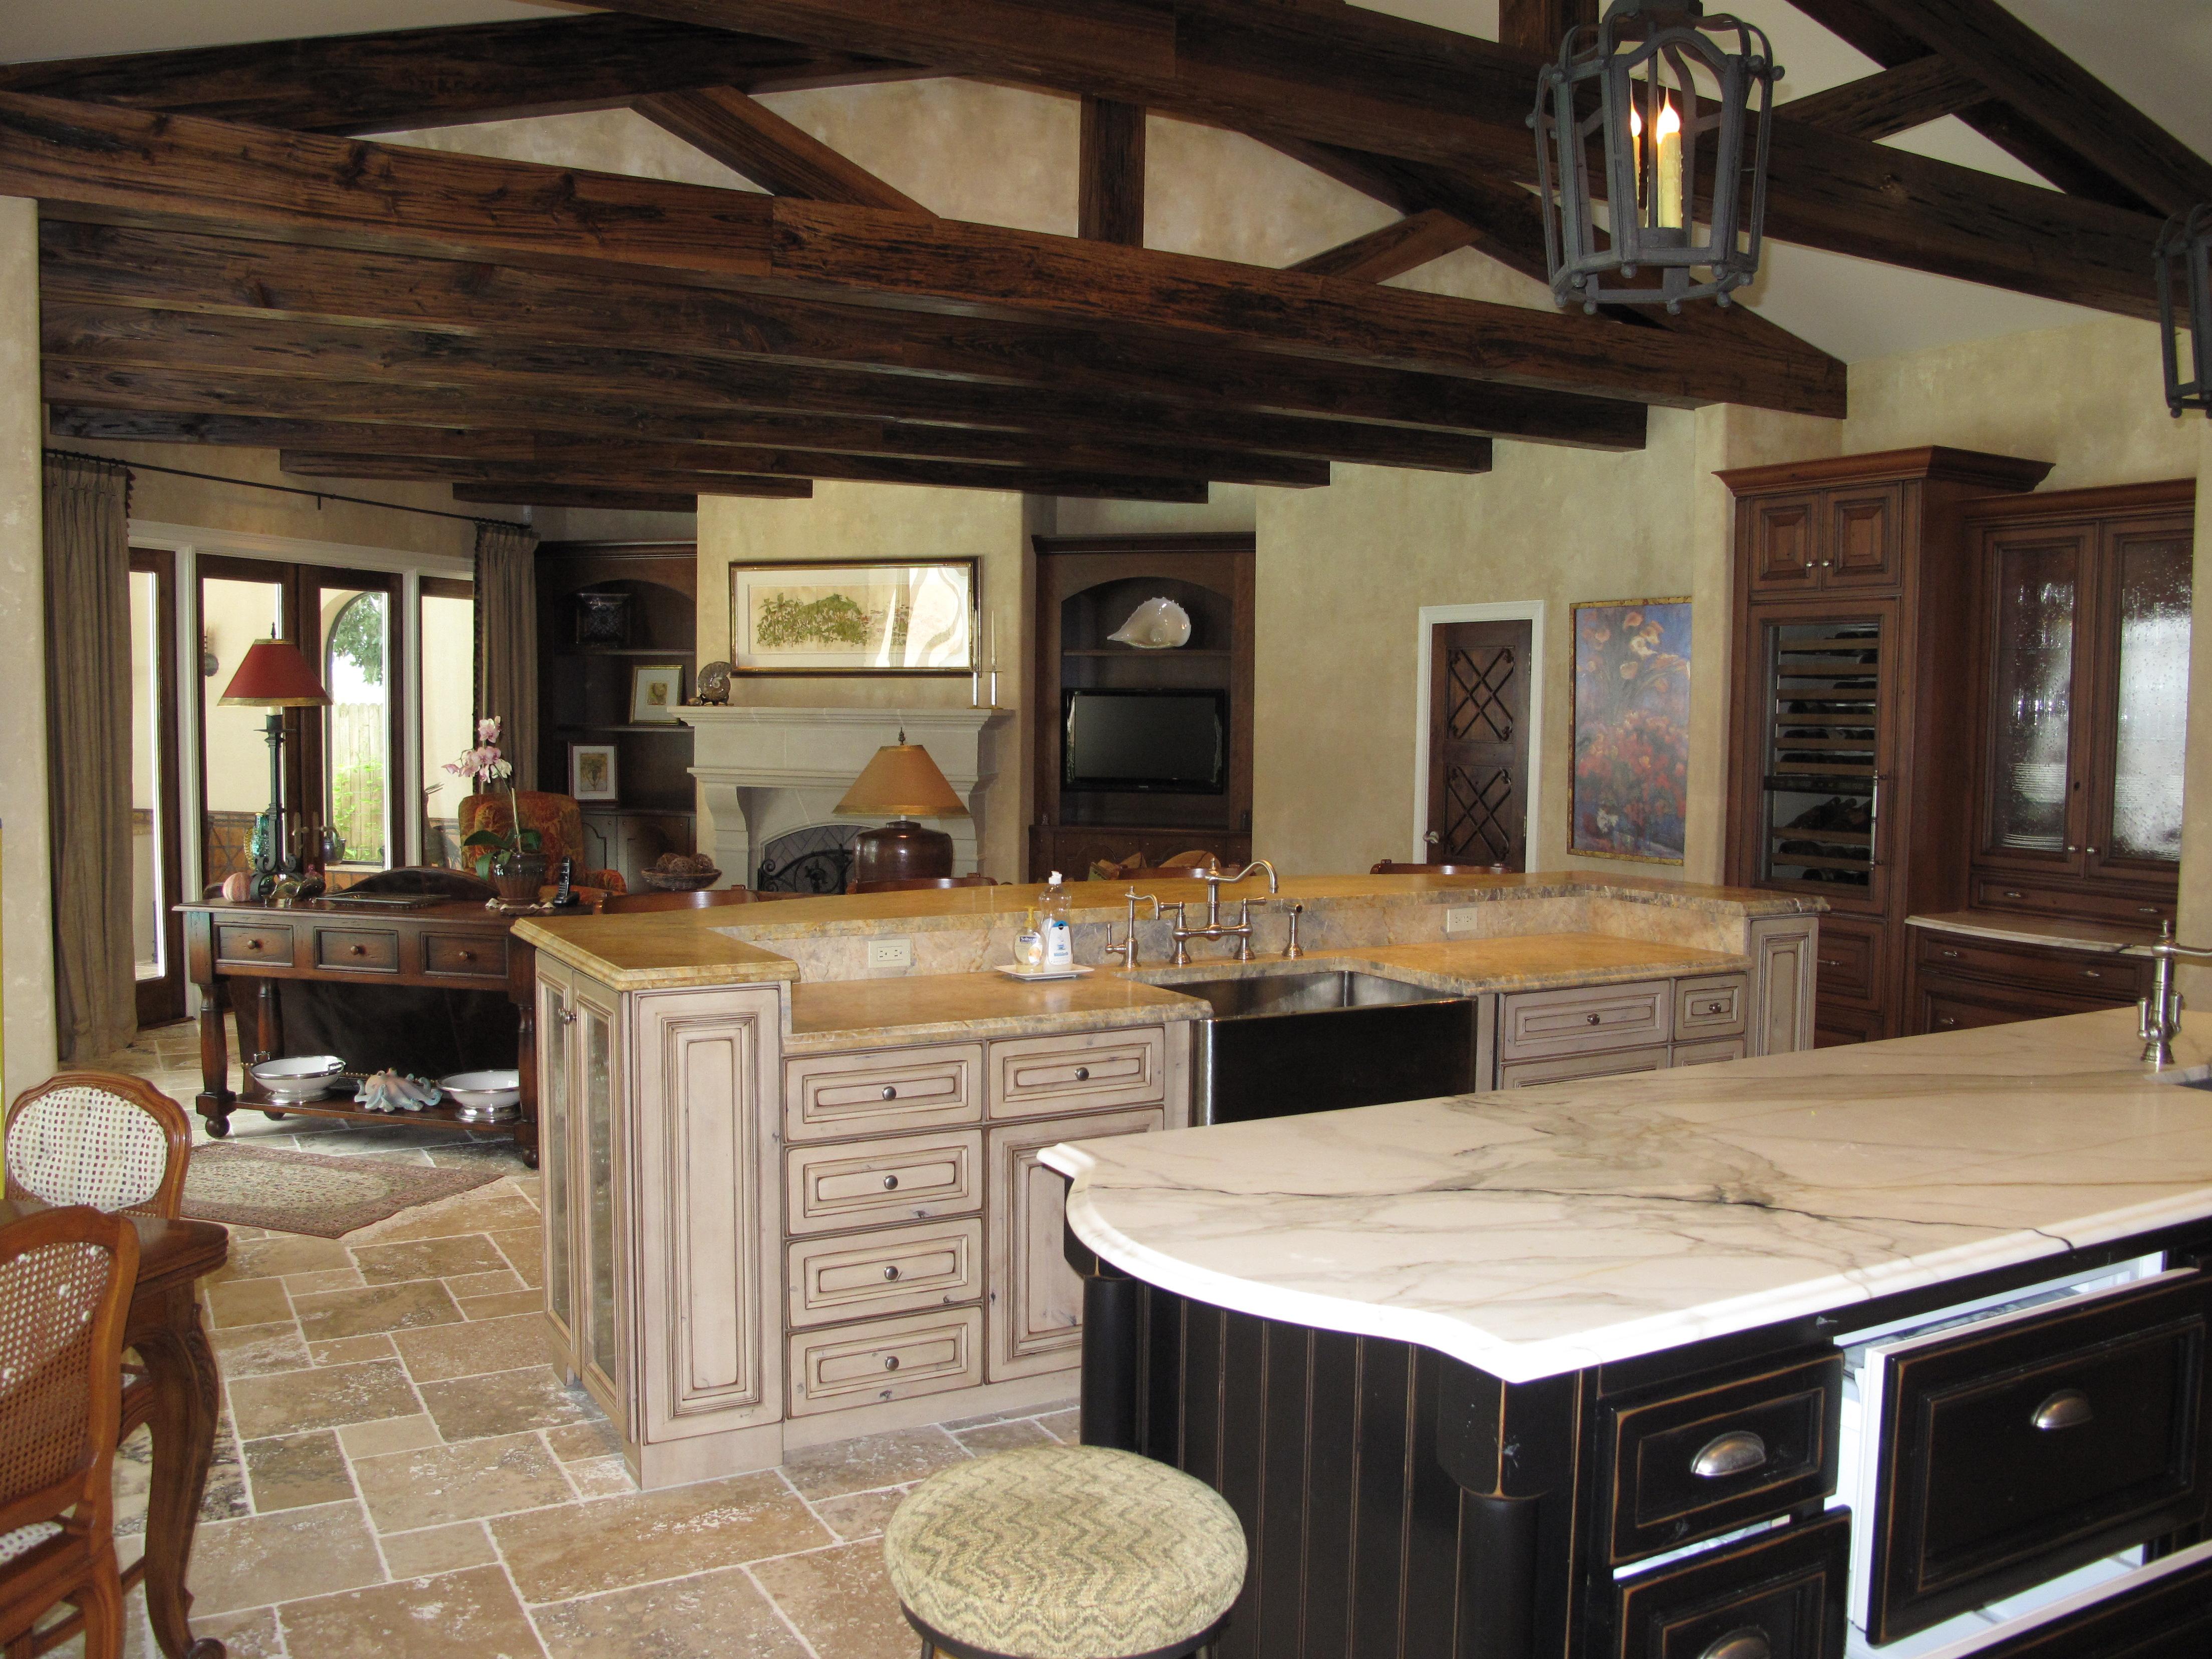 Custom Kitchens By Design 100  Custom Kitchensdesign   Custom Countertopsredoing